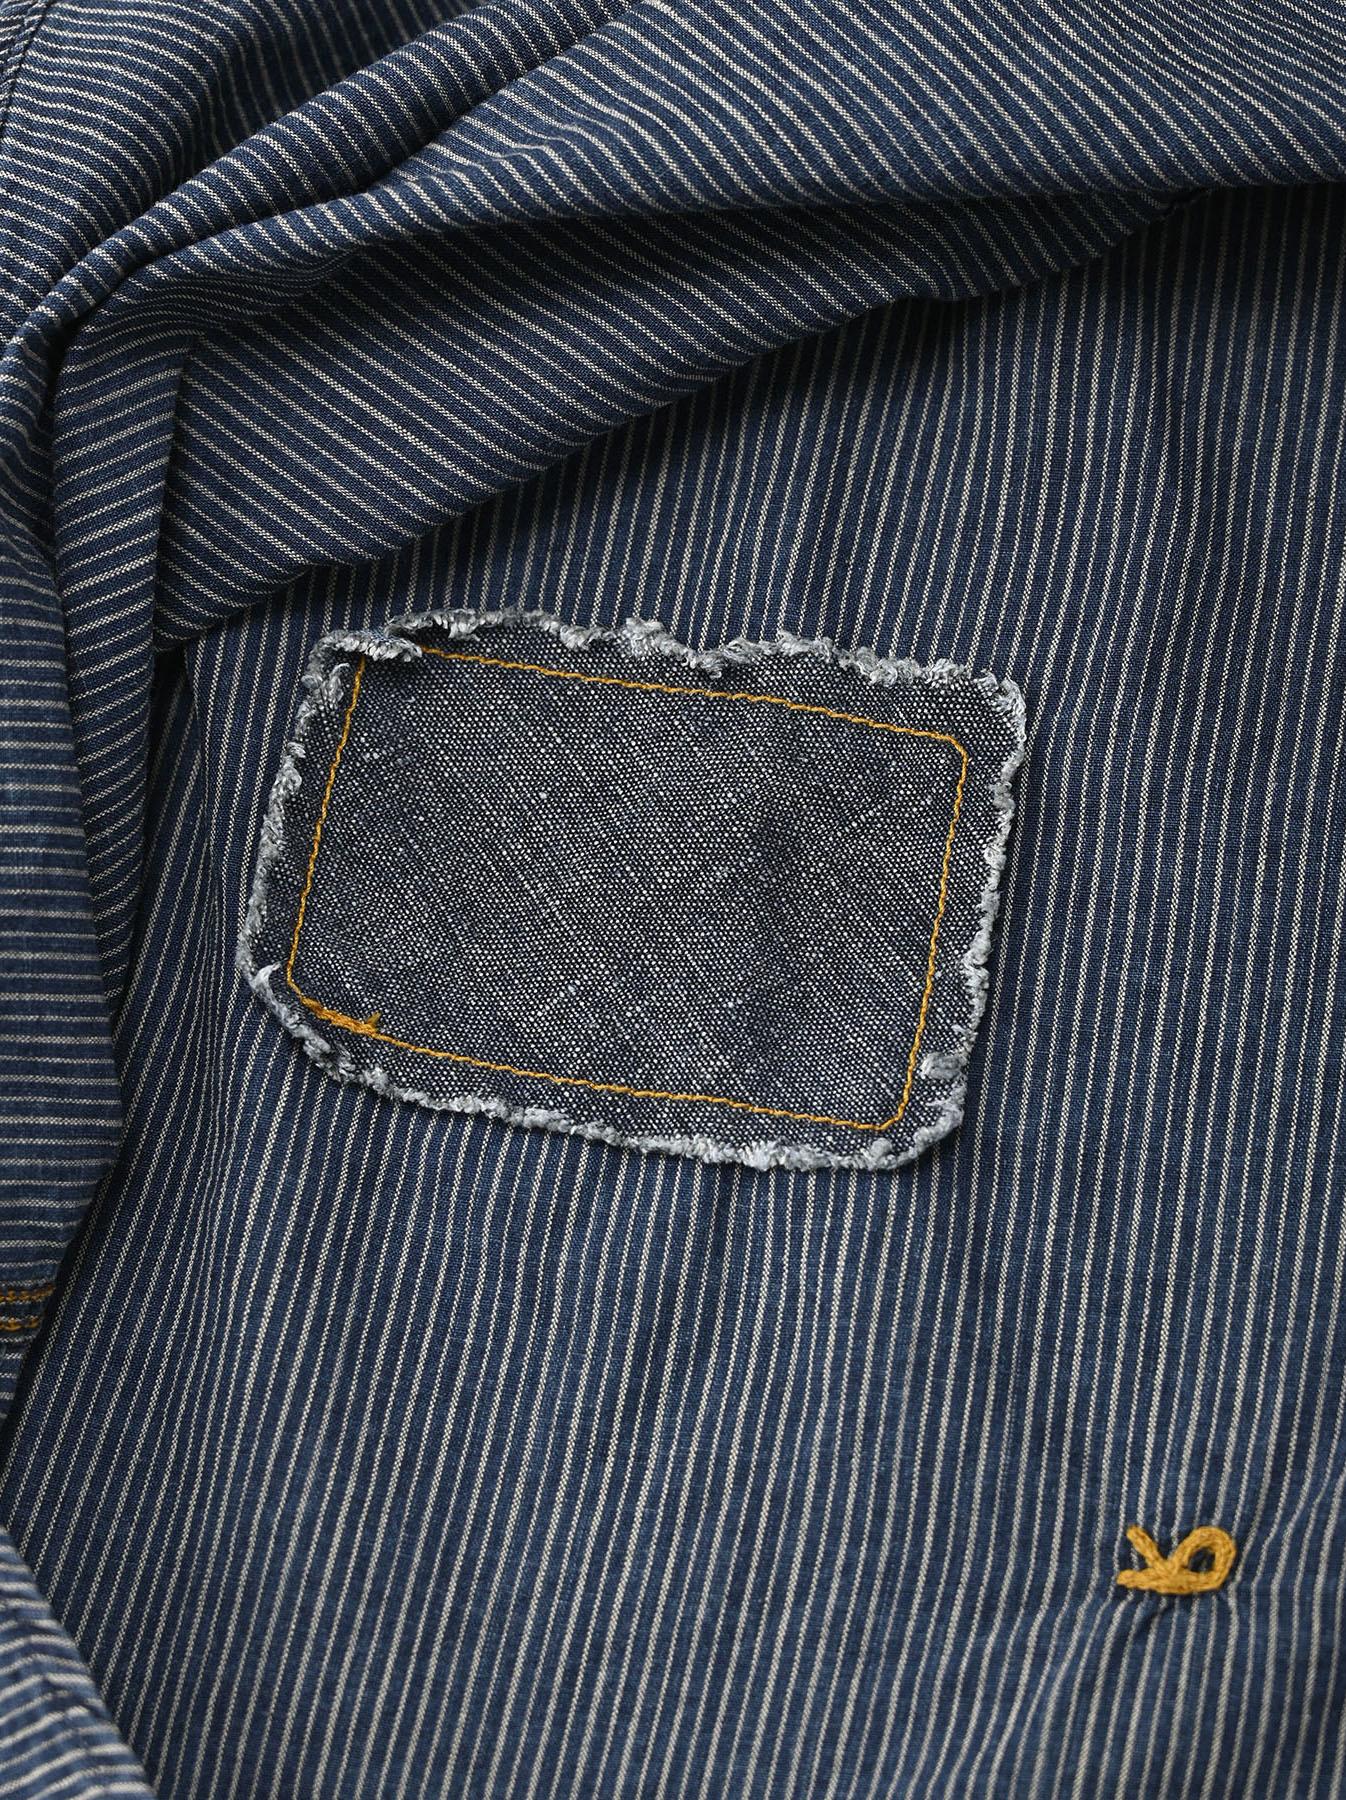 Indigo Hickory Tappet Ocean Stand Shirt-12